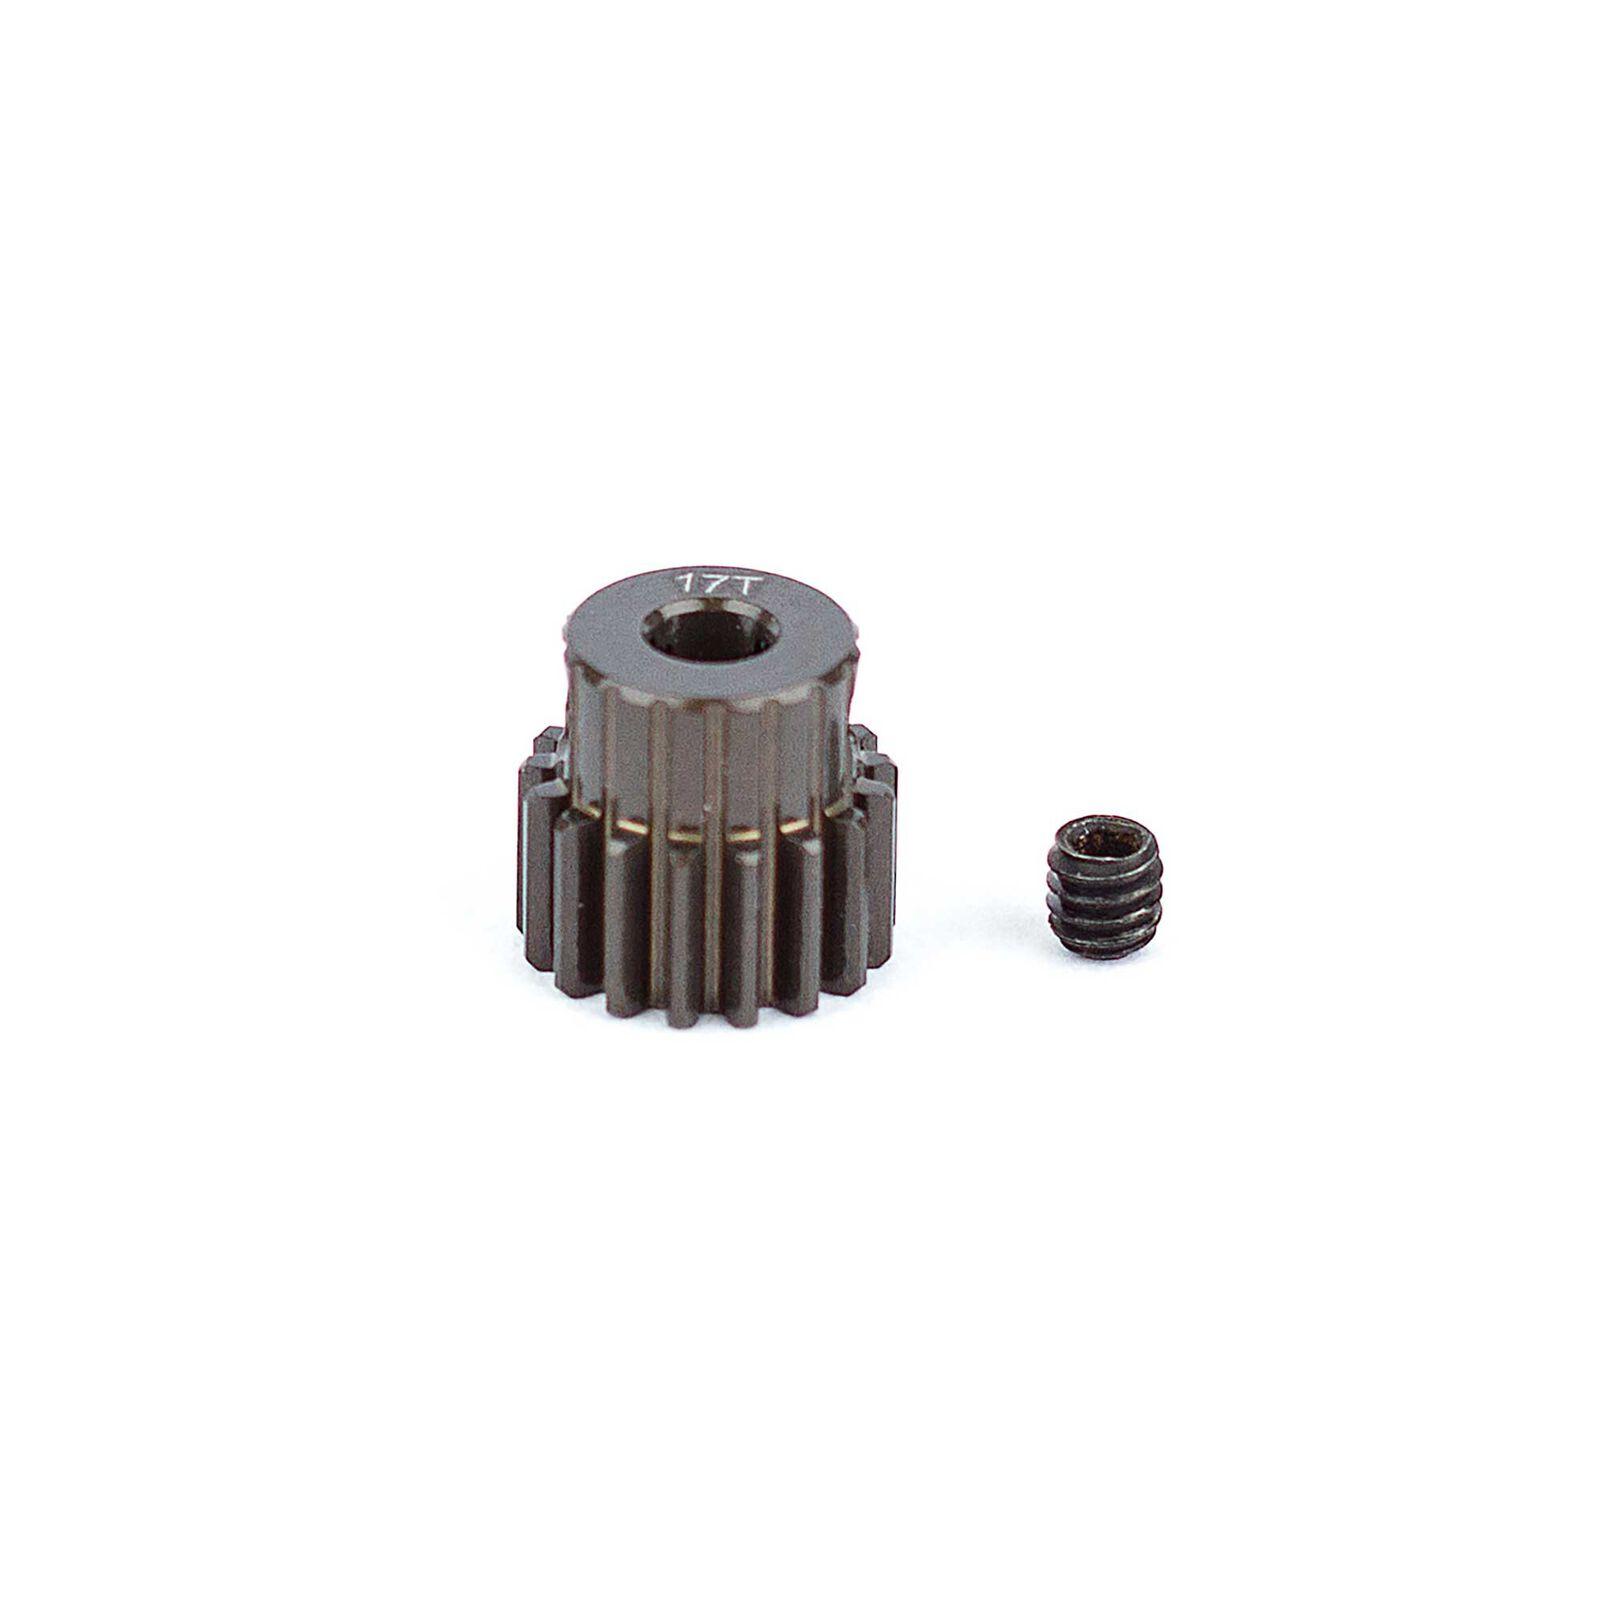 Factory Team Aluminum Pinion Gear, 17T, 48P, 1/8 shaft